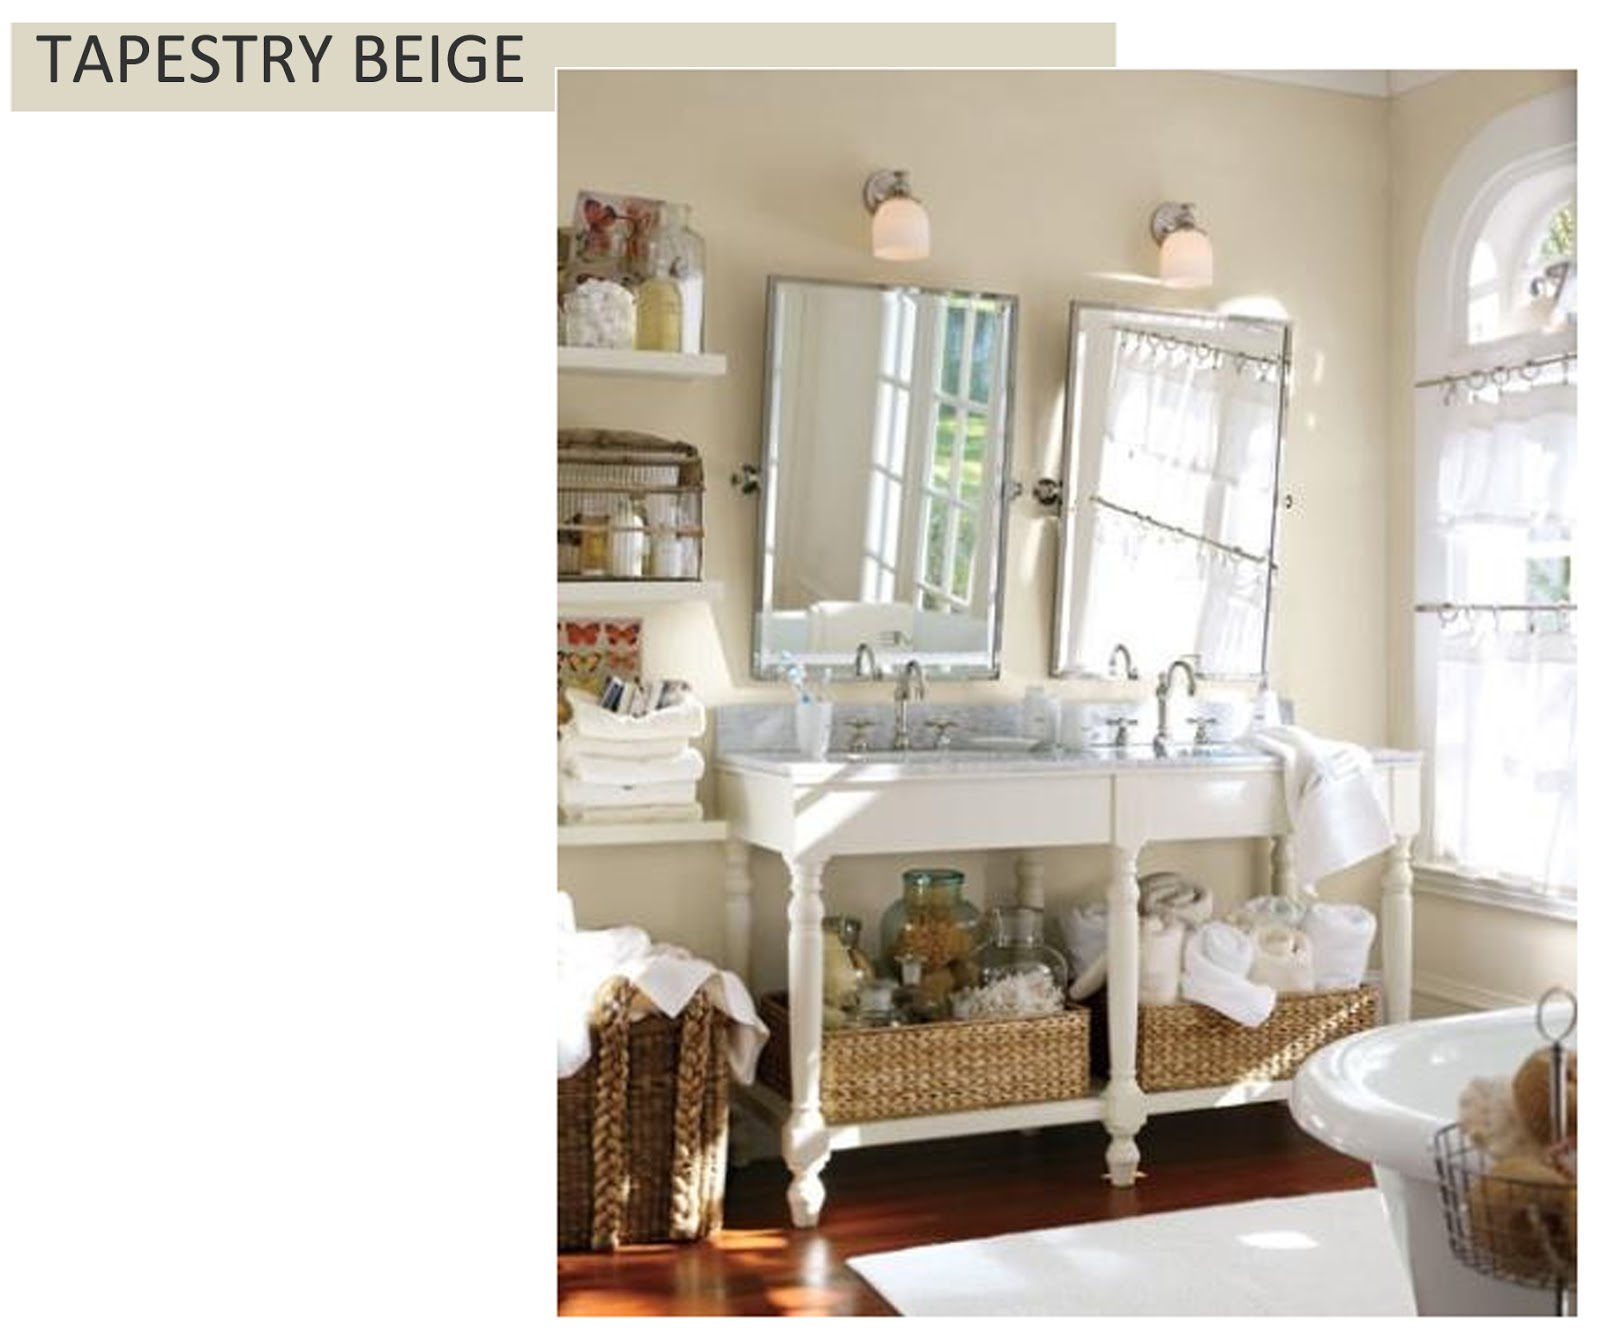 Benjamin Moore Tapestry Beige  Home Decorating Ideas